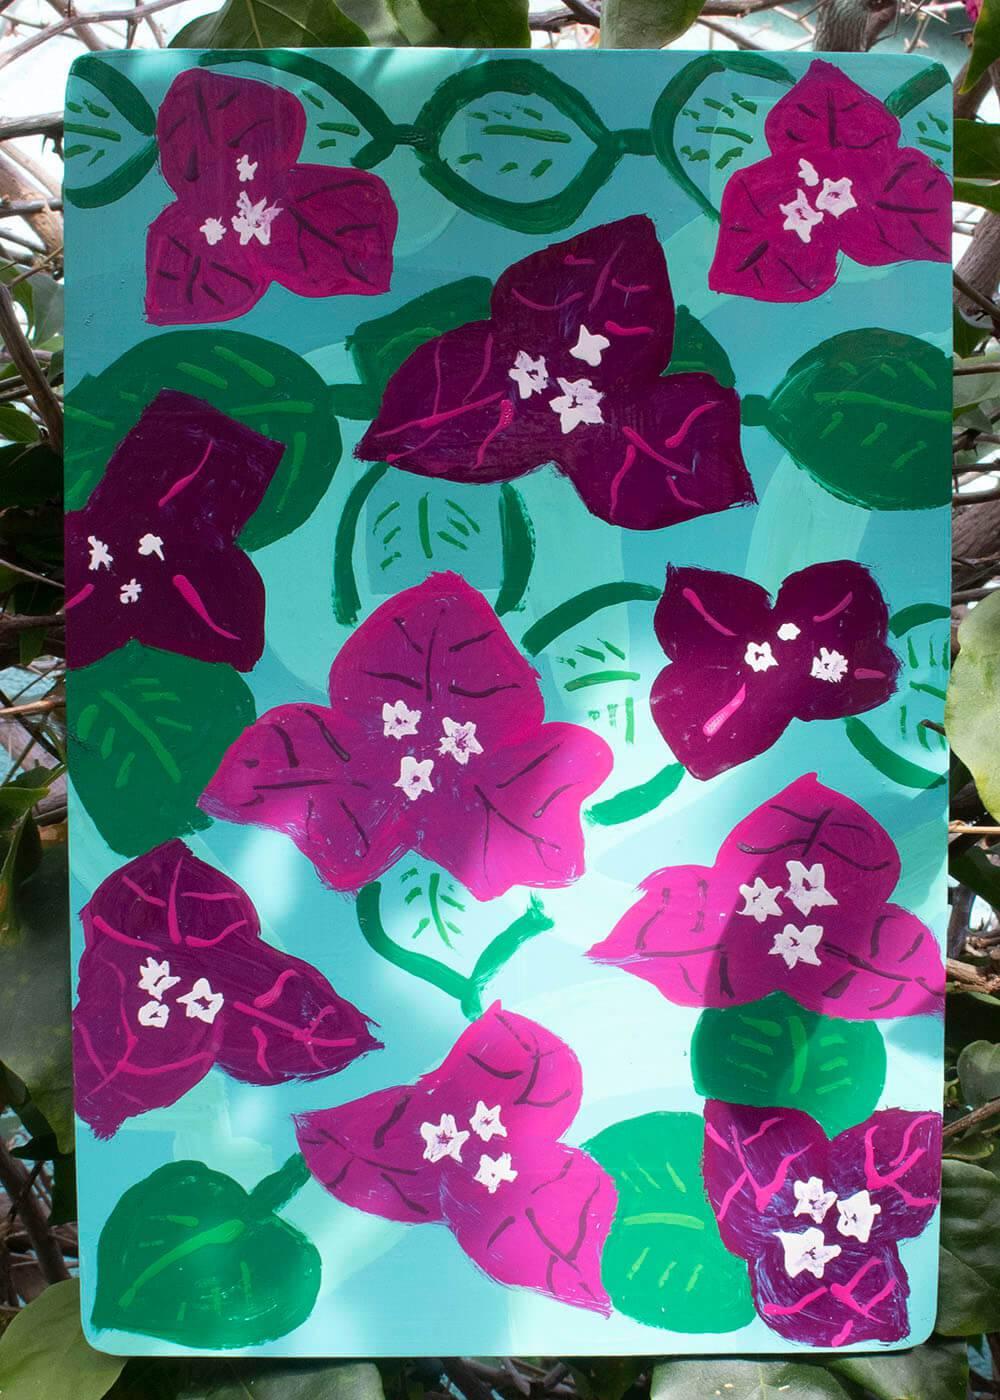 Magenta flower painted on aluminum panel.